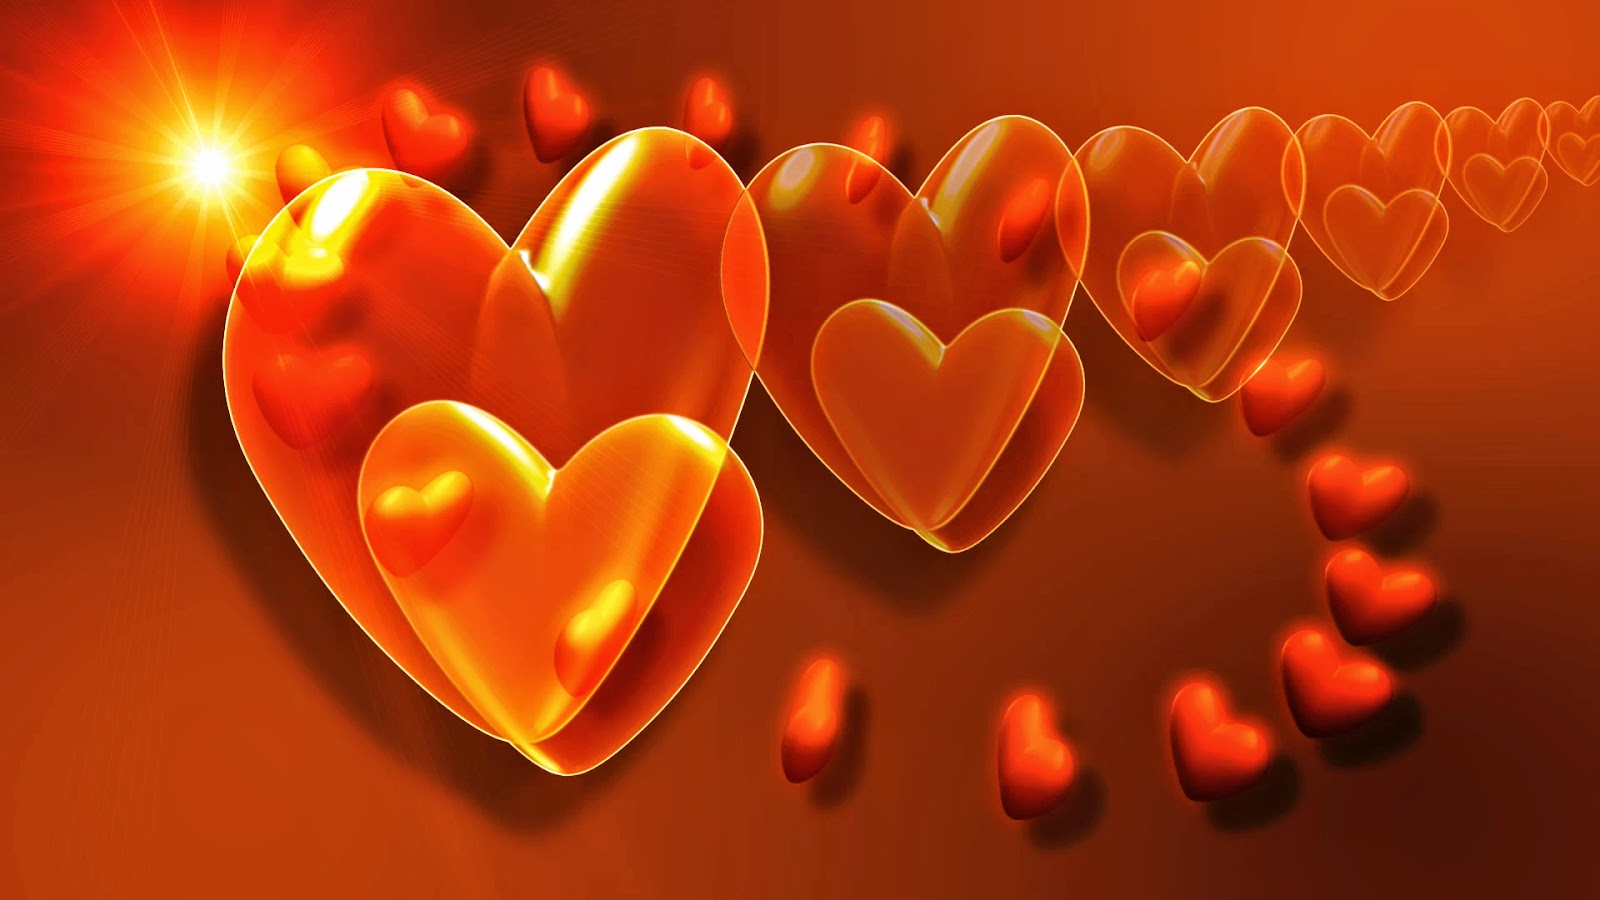 Happy Valentines Day Images Pics